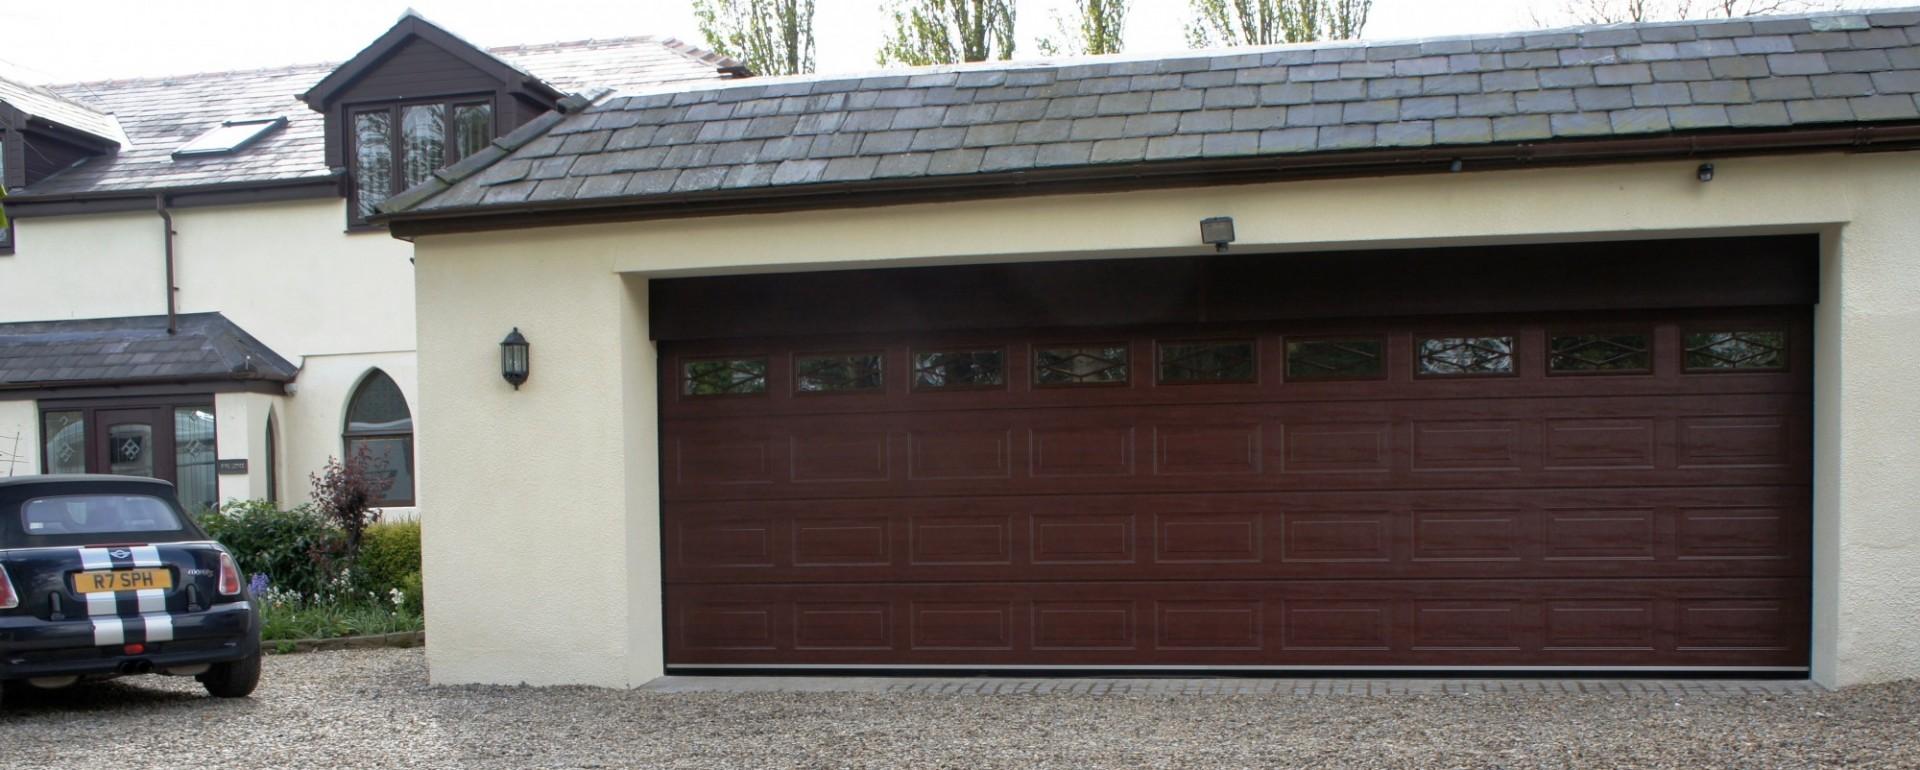 Garage doors preston lakes doors garage doors preston rubansaba